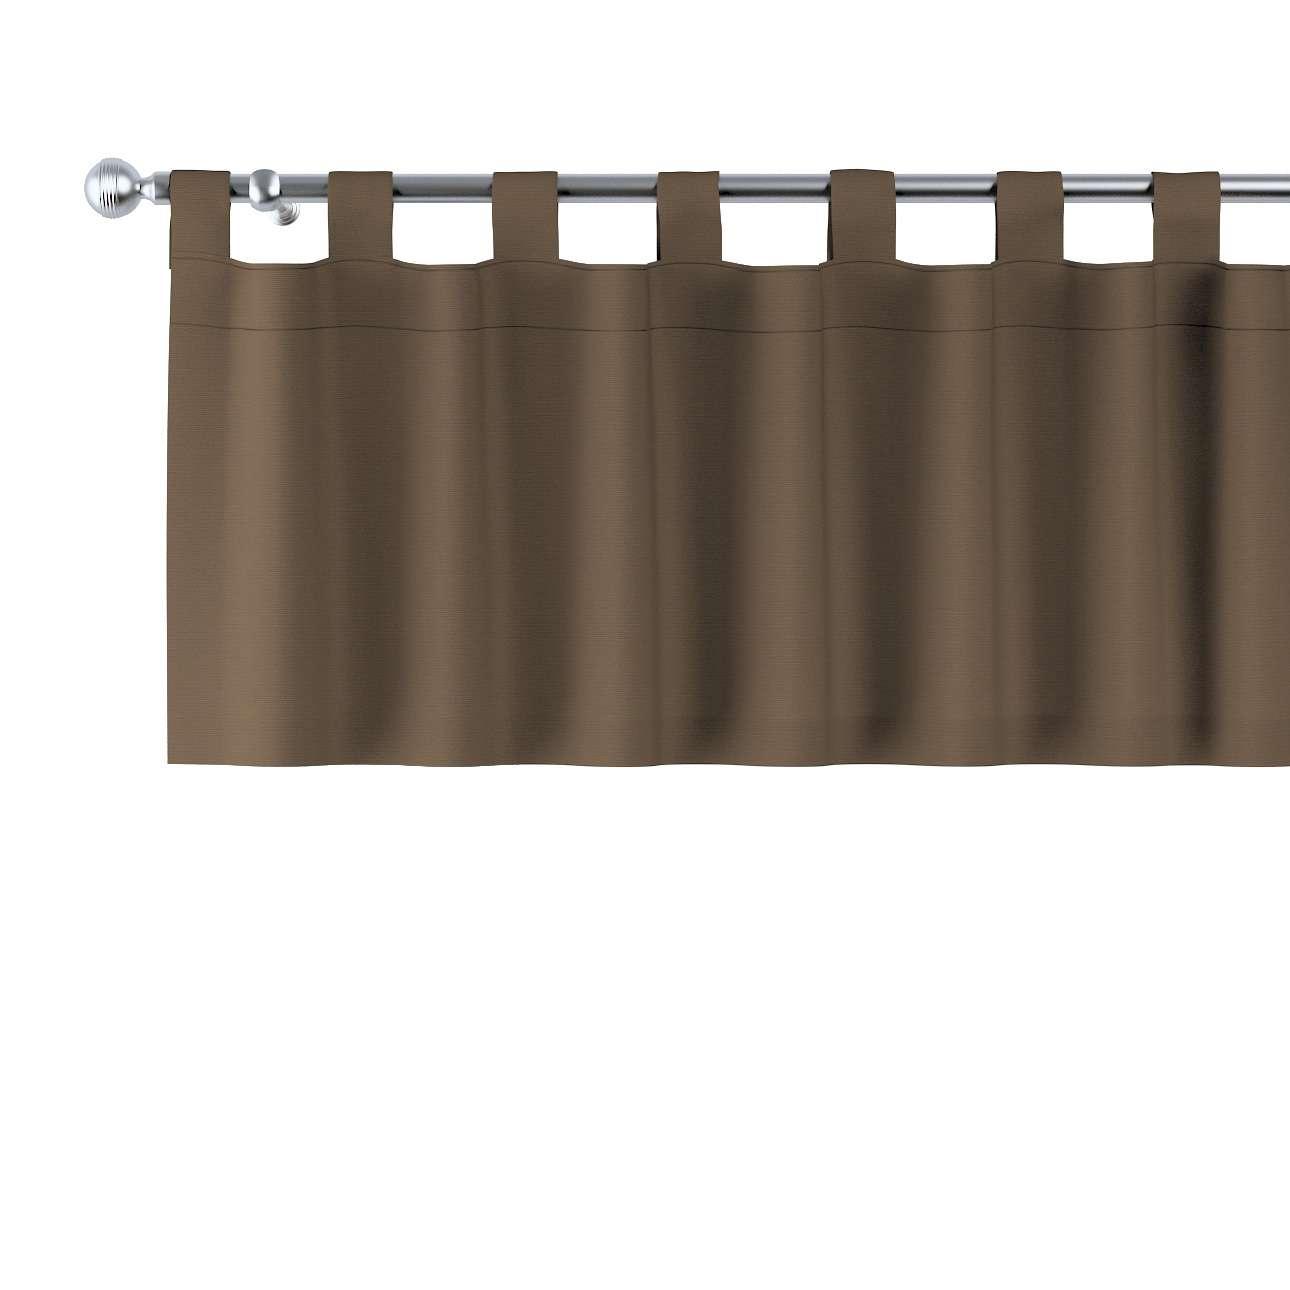 Gardinkappa med hällor i kollektionen Panama Cotton, Tyg: 702-02